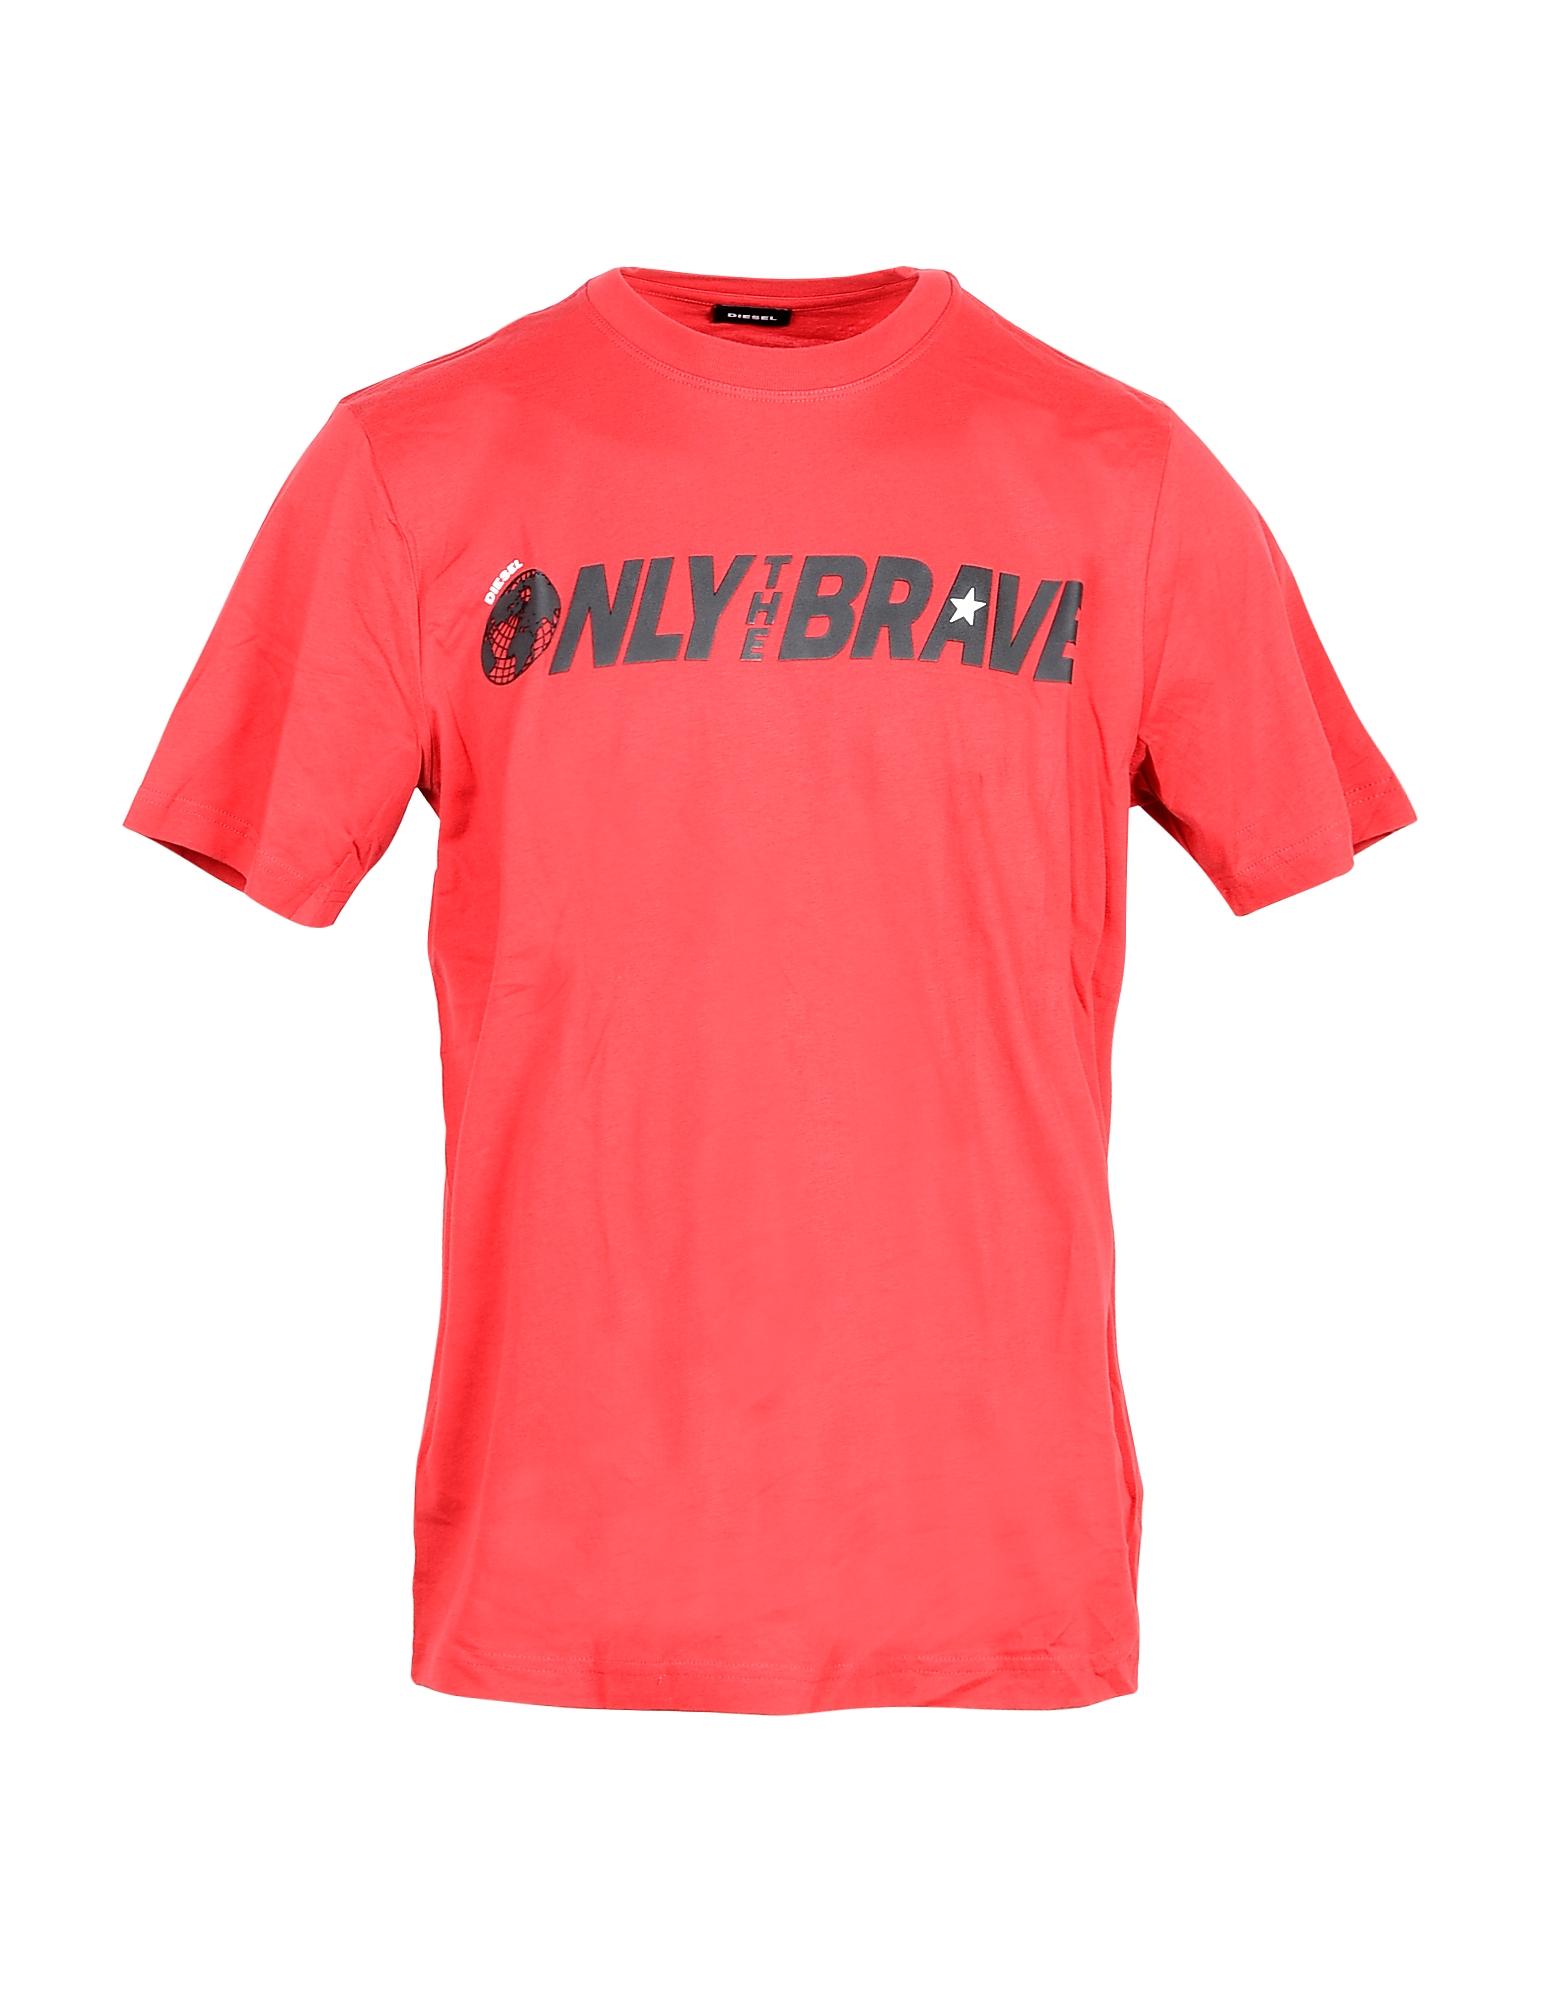 Diesel Designer T-Shirts, Only The Brave Print Red Cotton Men's T-shirt